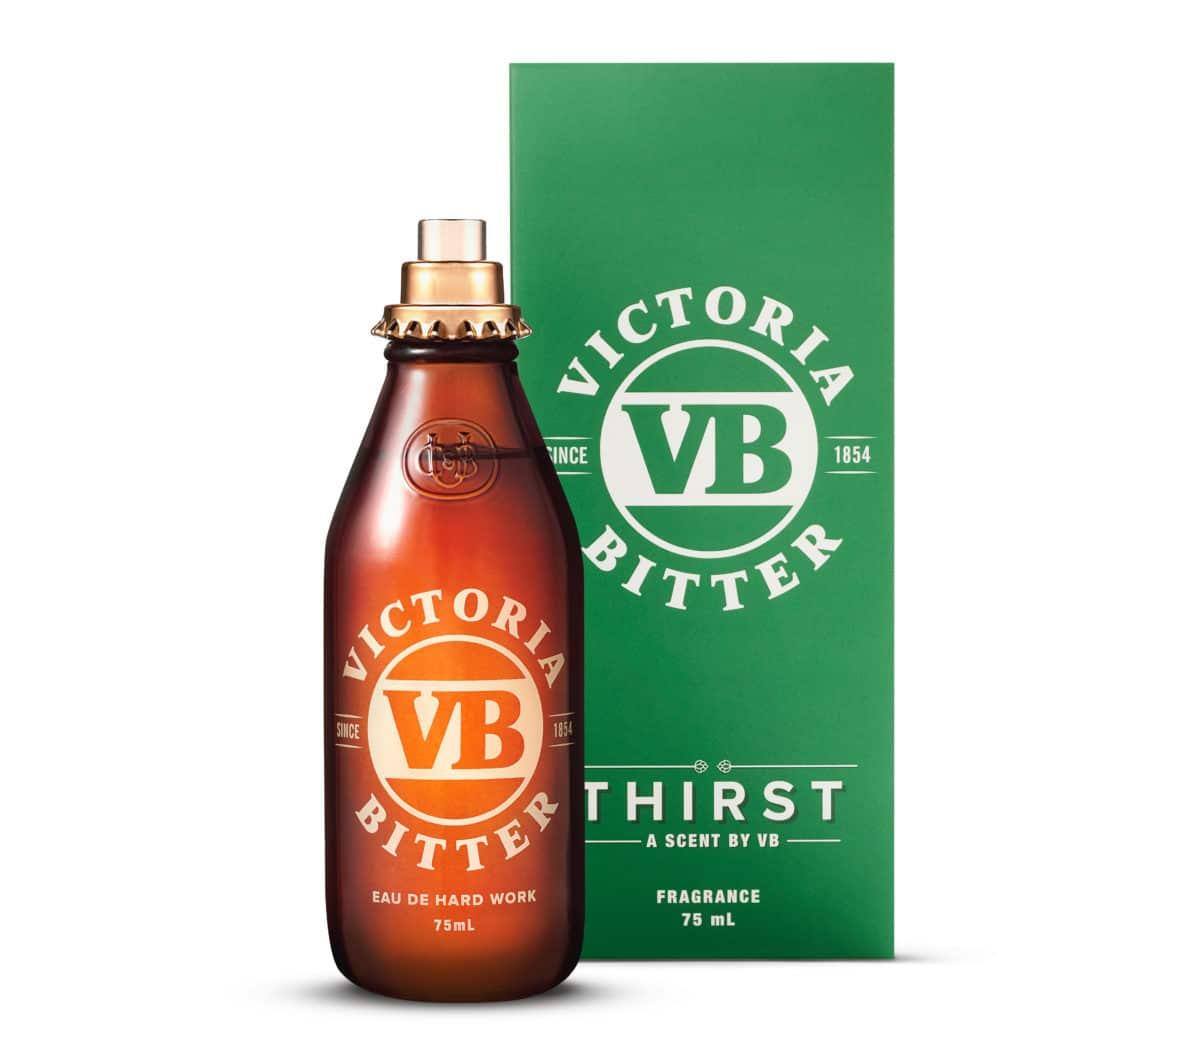 VB Fragrance